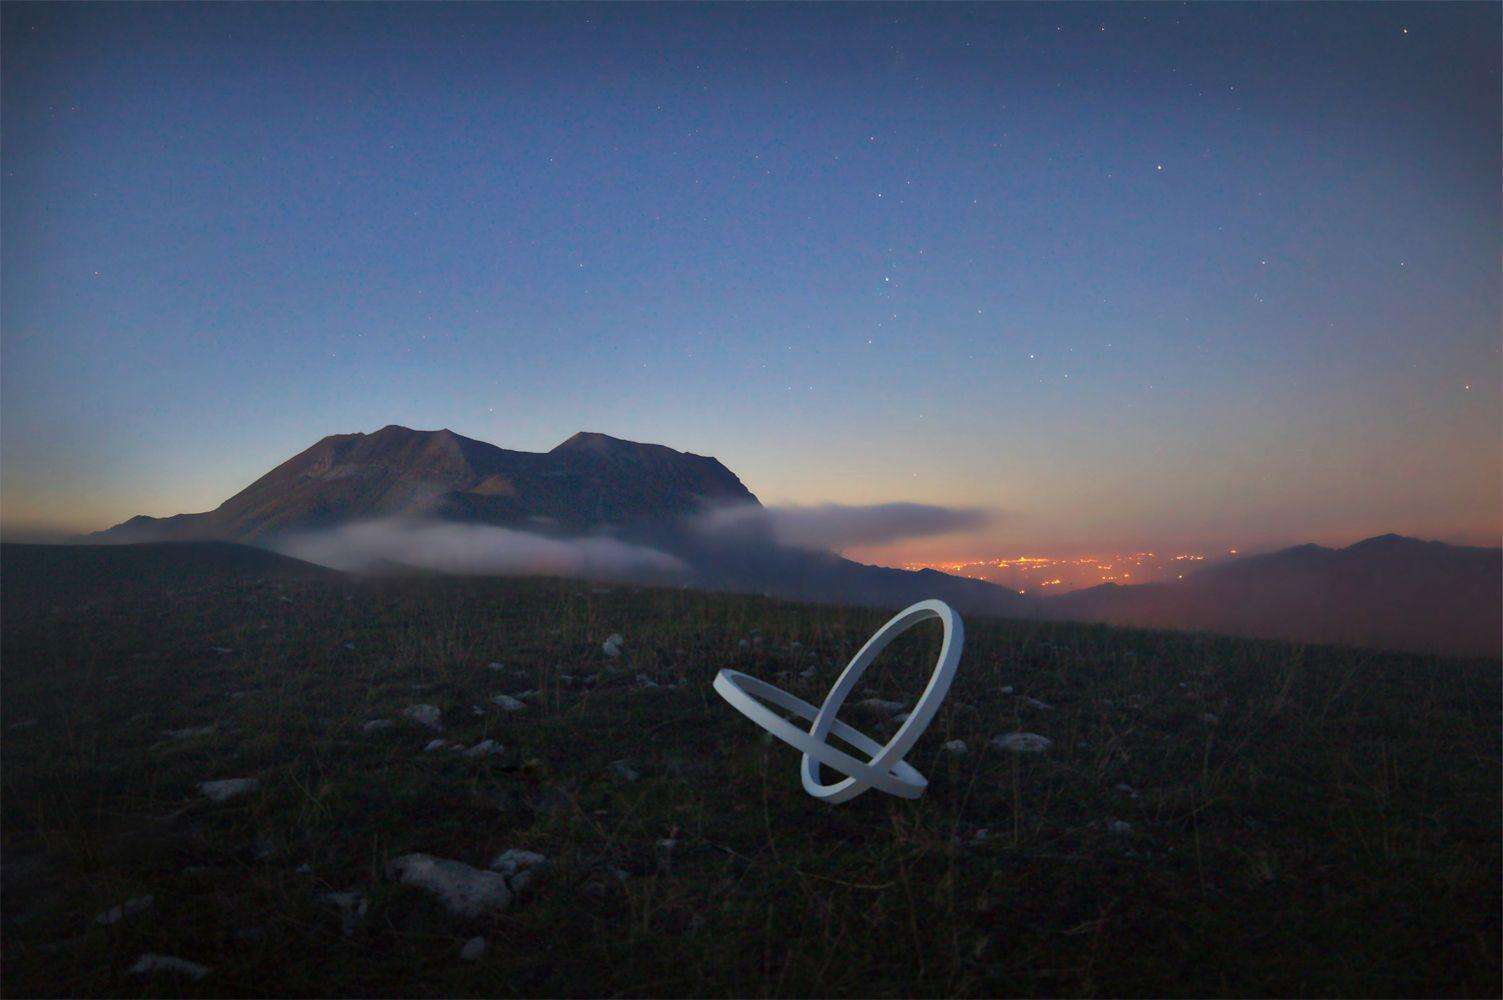 INFINITY #sunset #sibillini #lamp #design #stars #marche #italy #art #sculpture #minimal #white